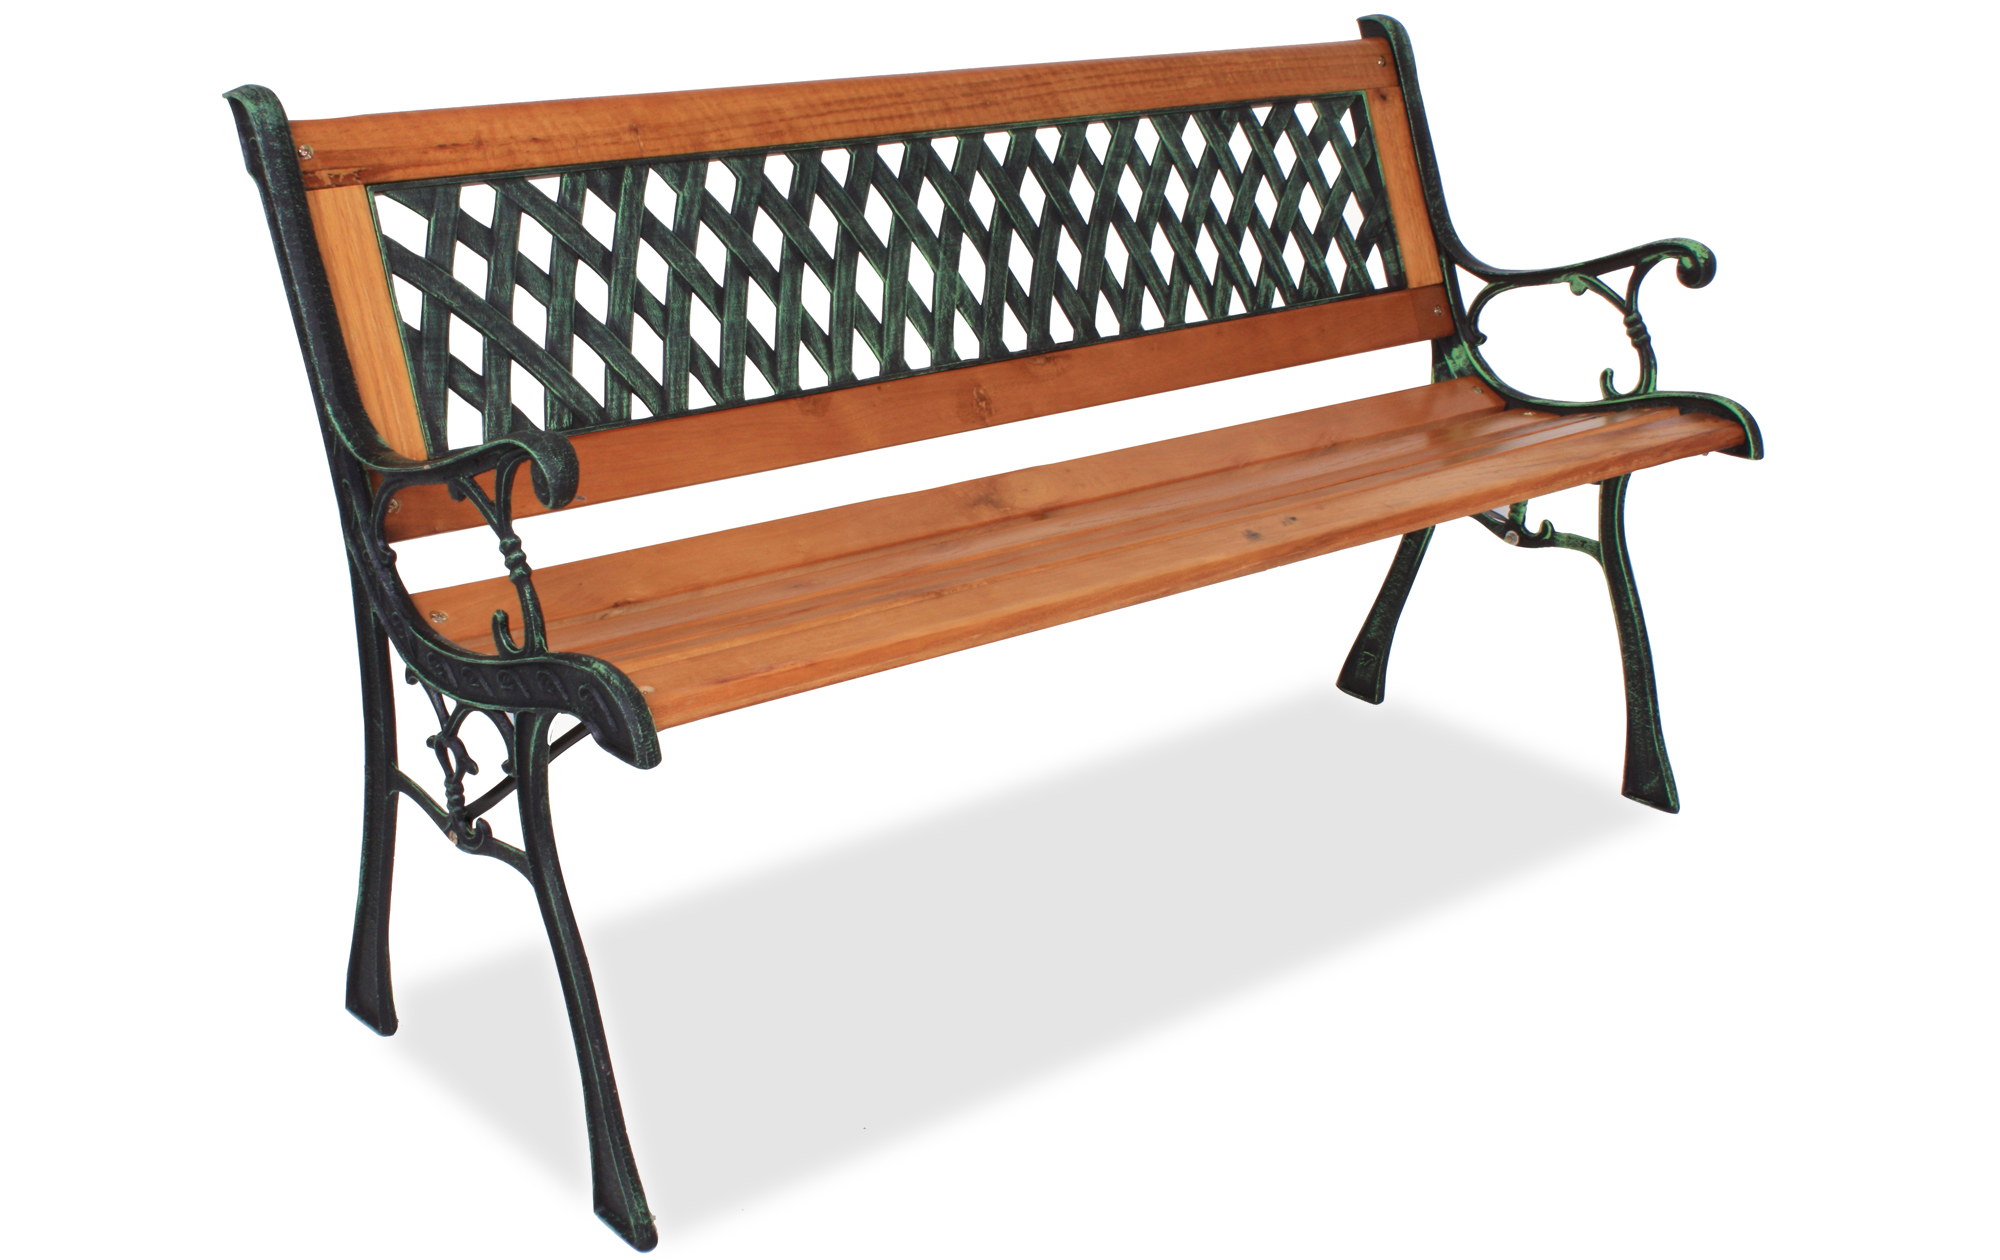 Wetterfeste Gartenbank Metall Und Holz